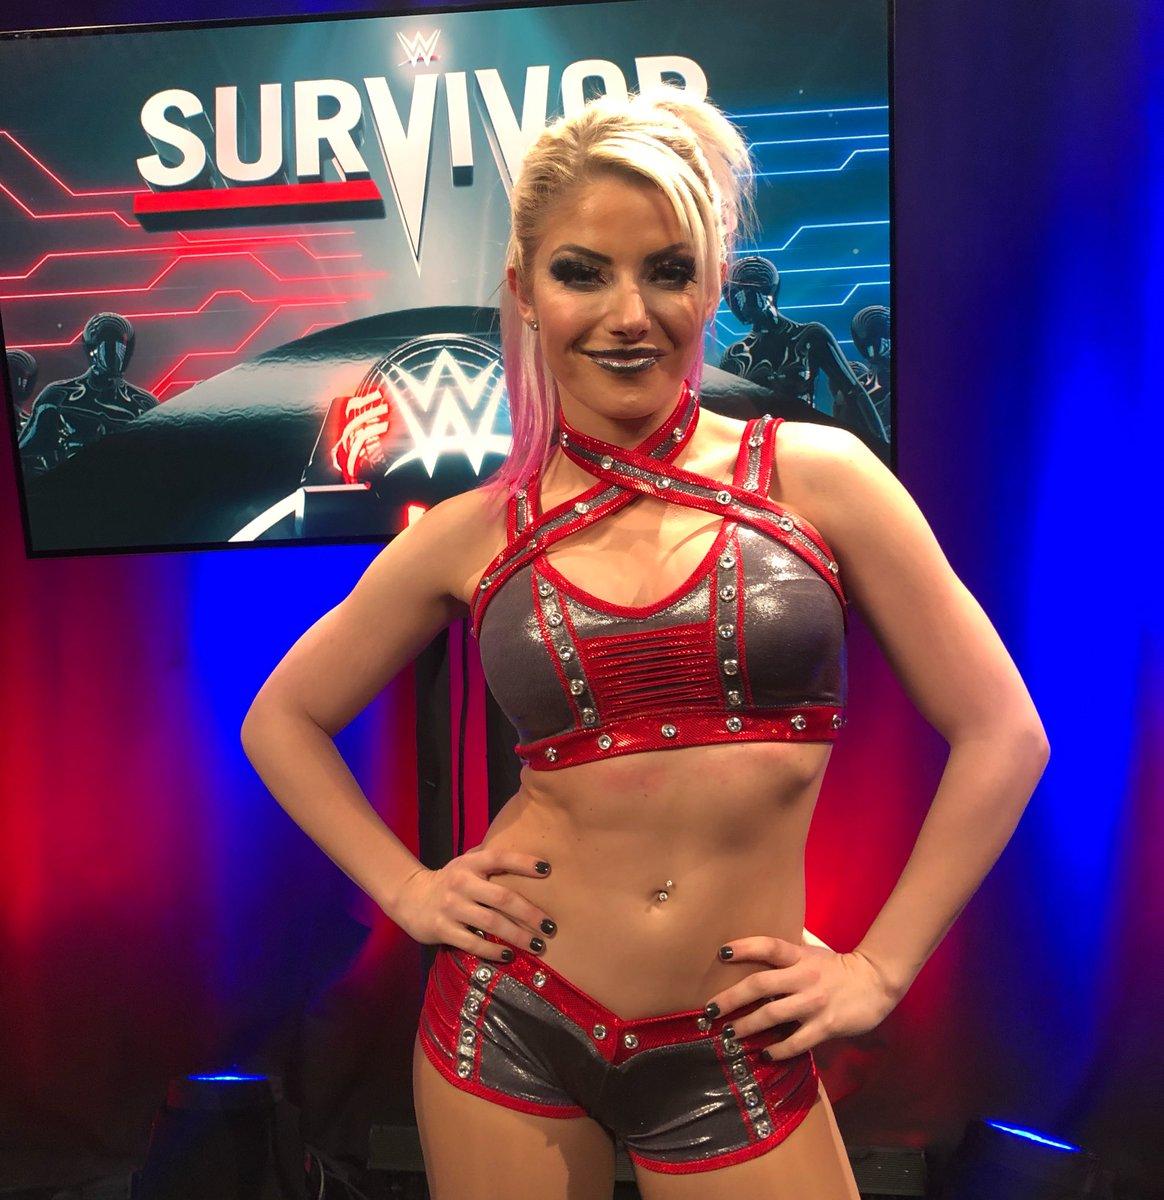 My new @Mattel #WWEEliteSquad figure with @WWE #SurvivorSeries gear comes to @Walmart this December! #HaveAVeryBlissfulChristmas